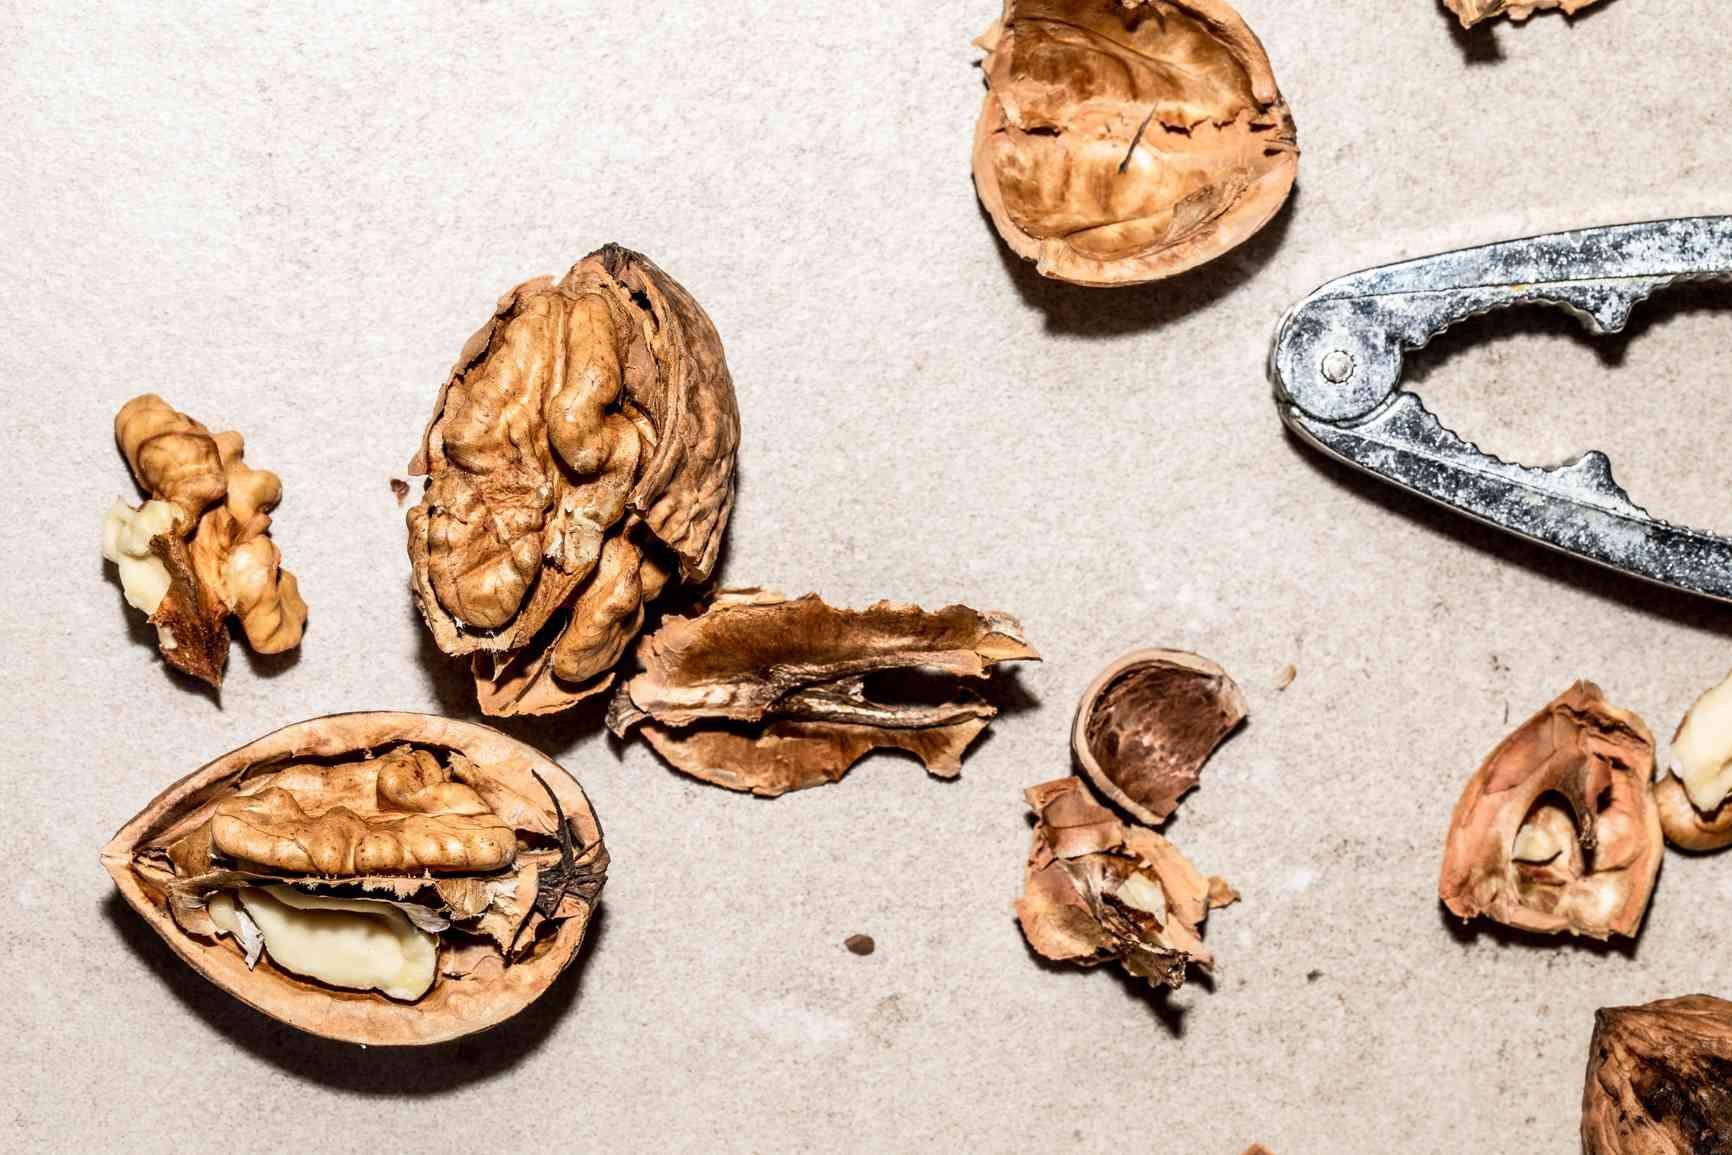 walnut shells cracked open